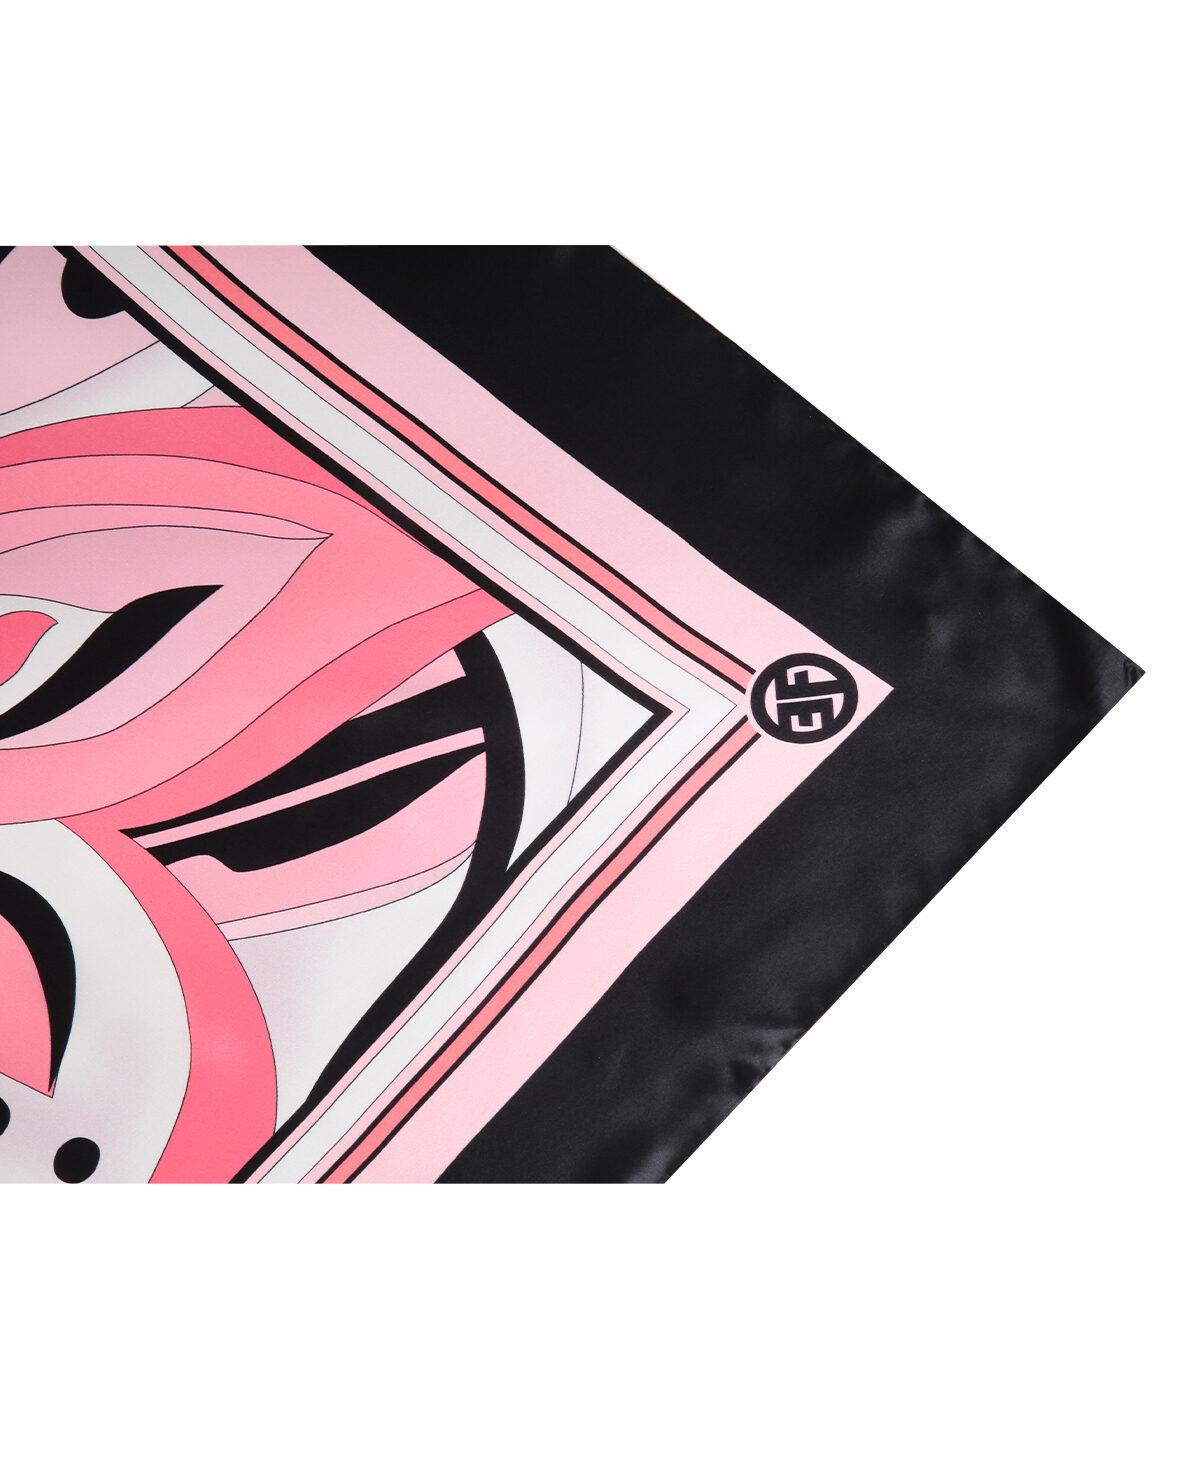 ELISA FANTI S/S 2021 SERIE EFHypnoticFantasy FOULARD 90x90